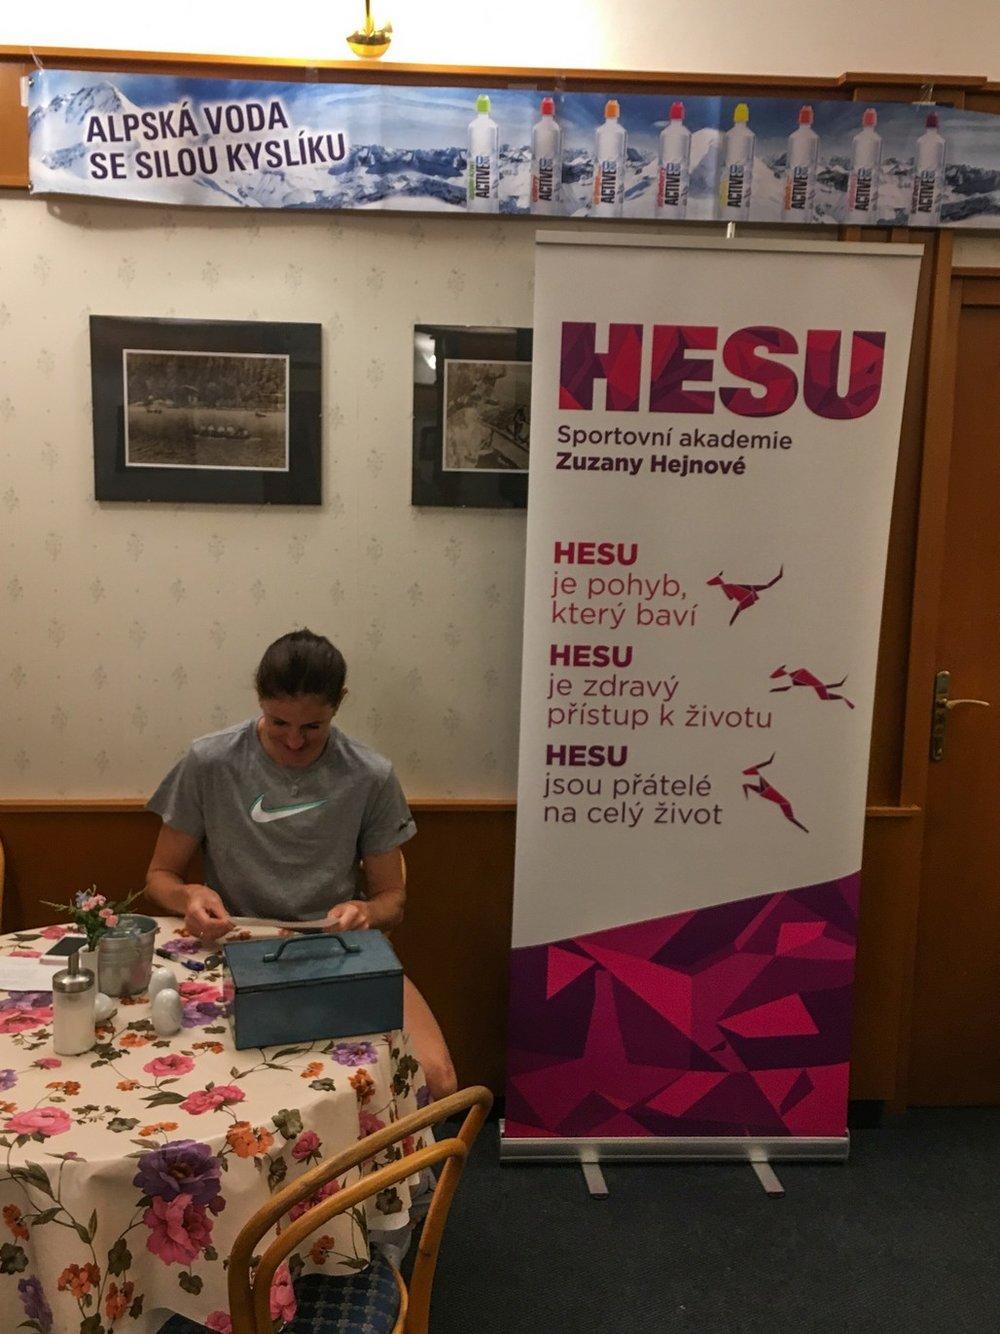 HESU_Susice_II_crv_2018-108.jpg